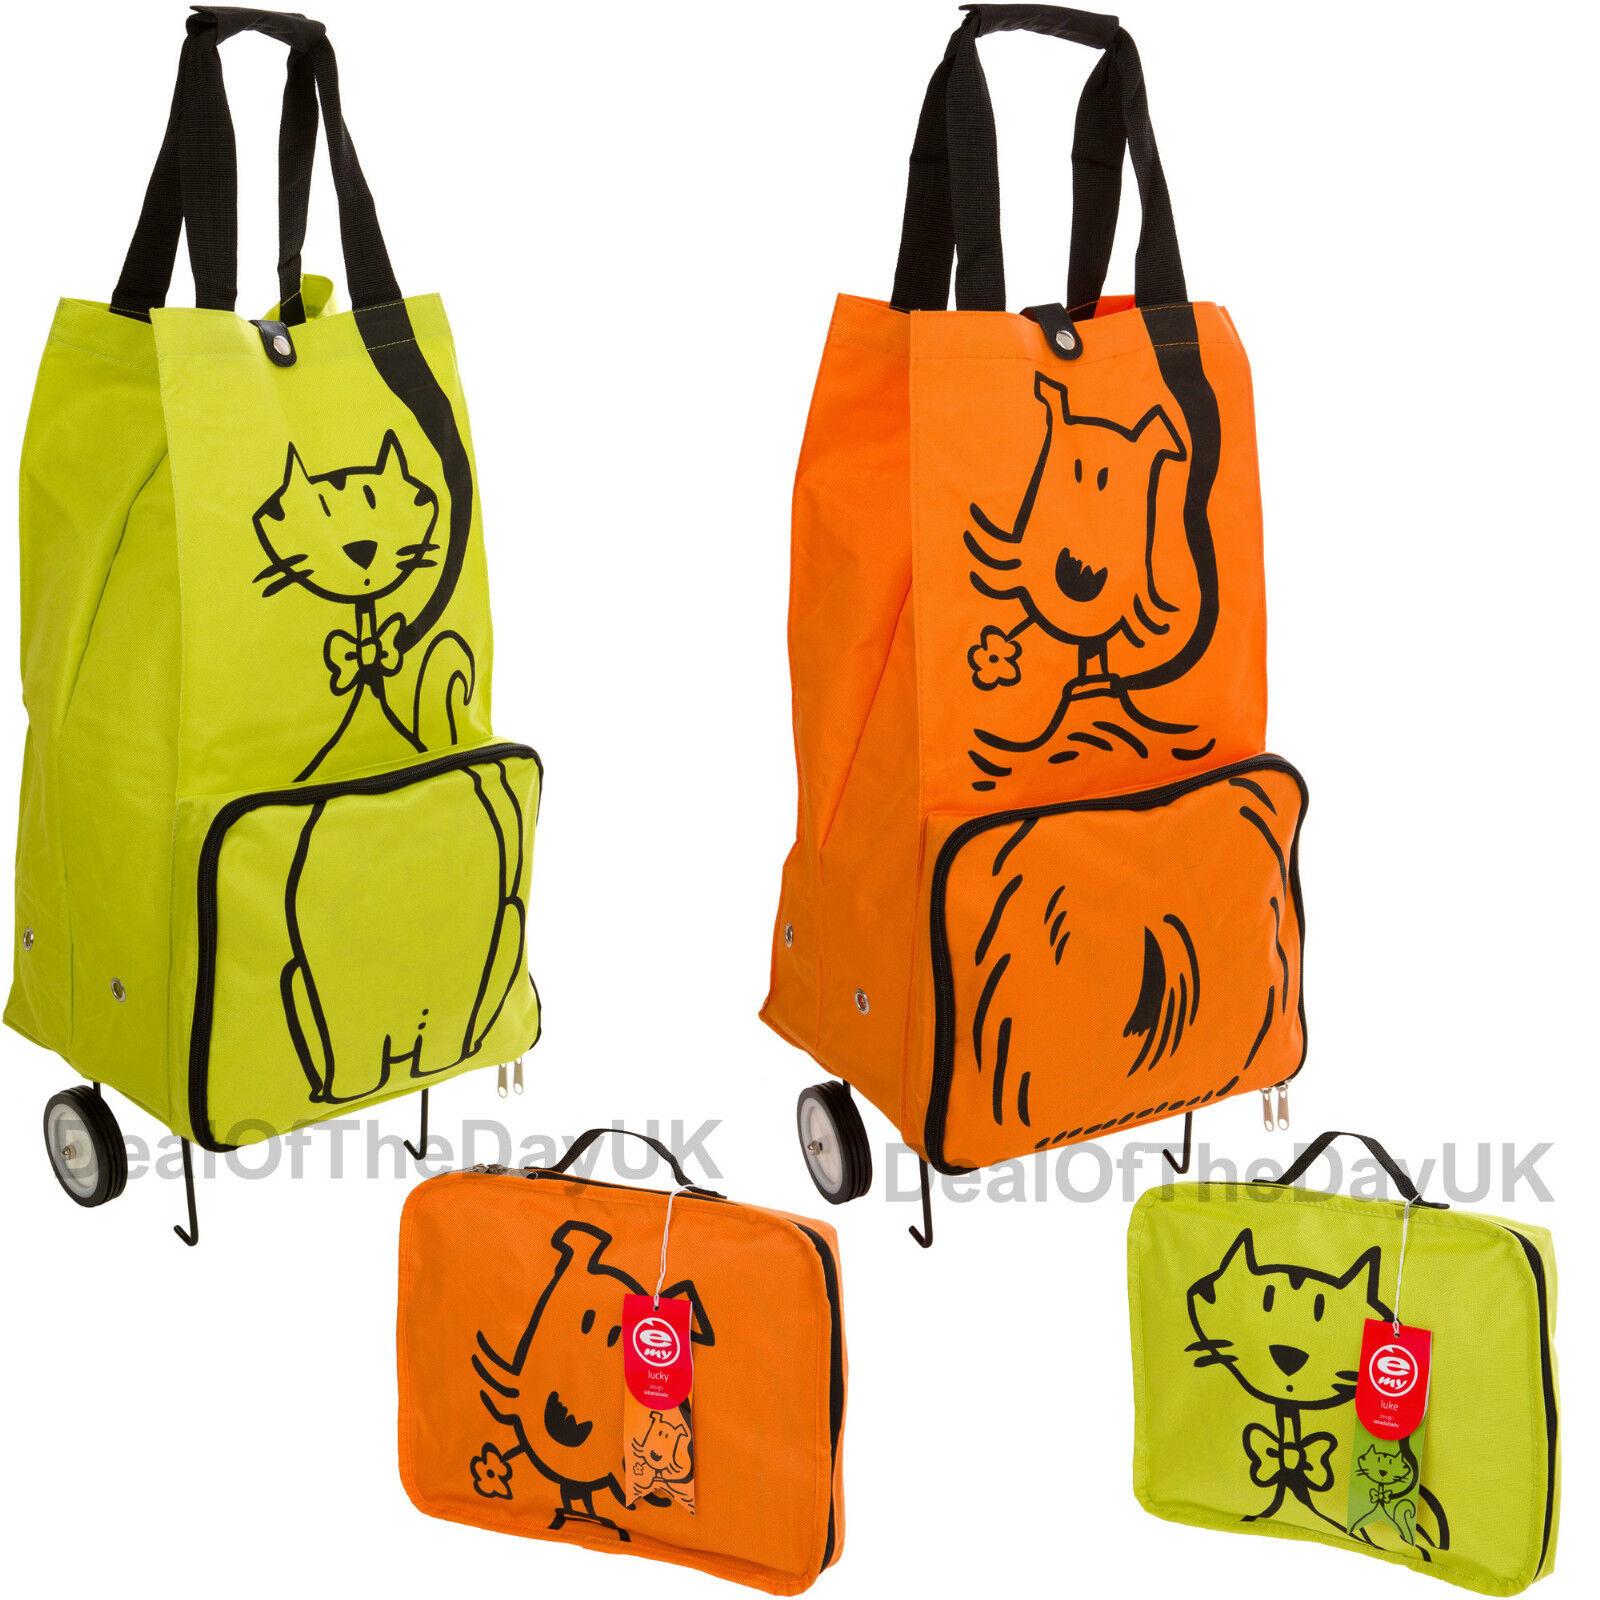 birkin 25 price - Shopping Trolley | eBay